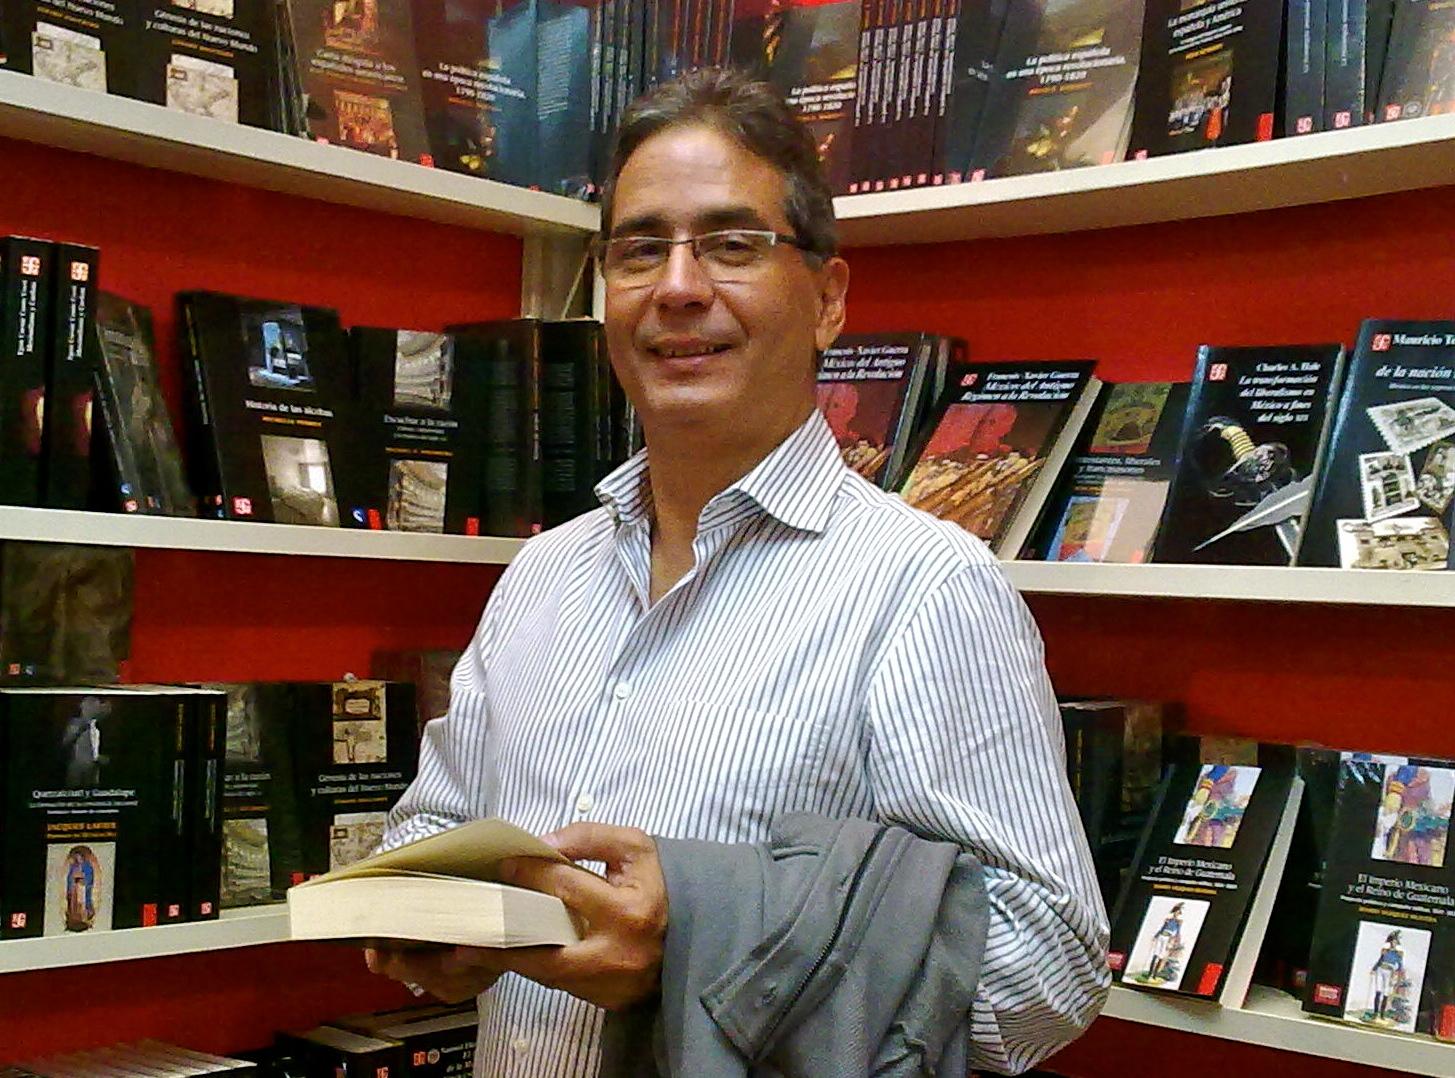 Dr. Gustavo Lins Ribeiro